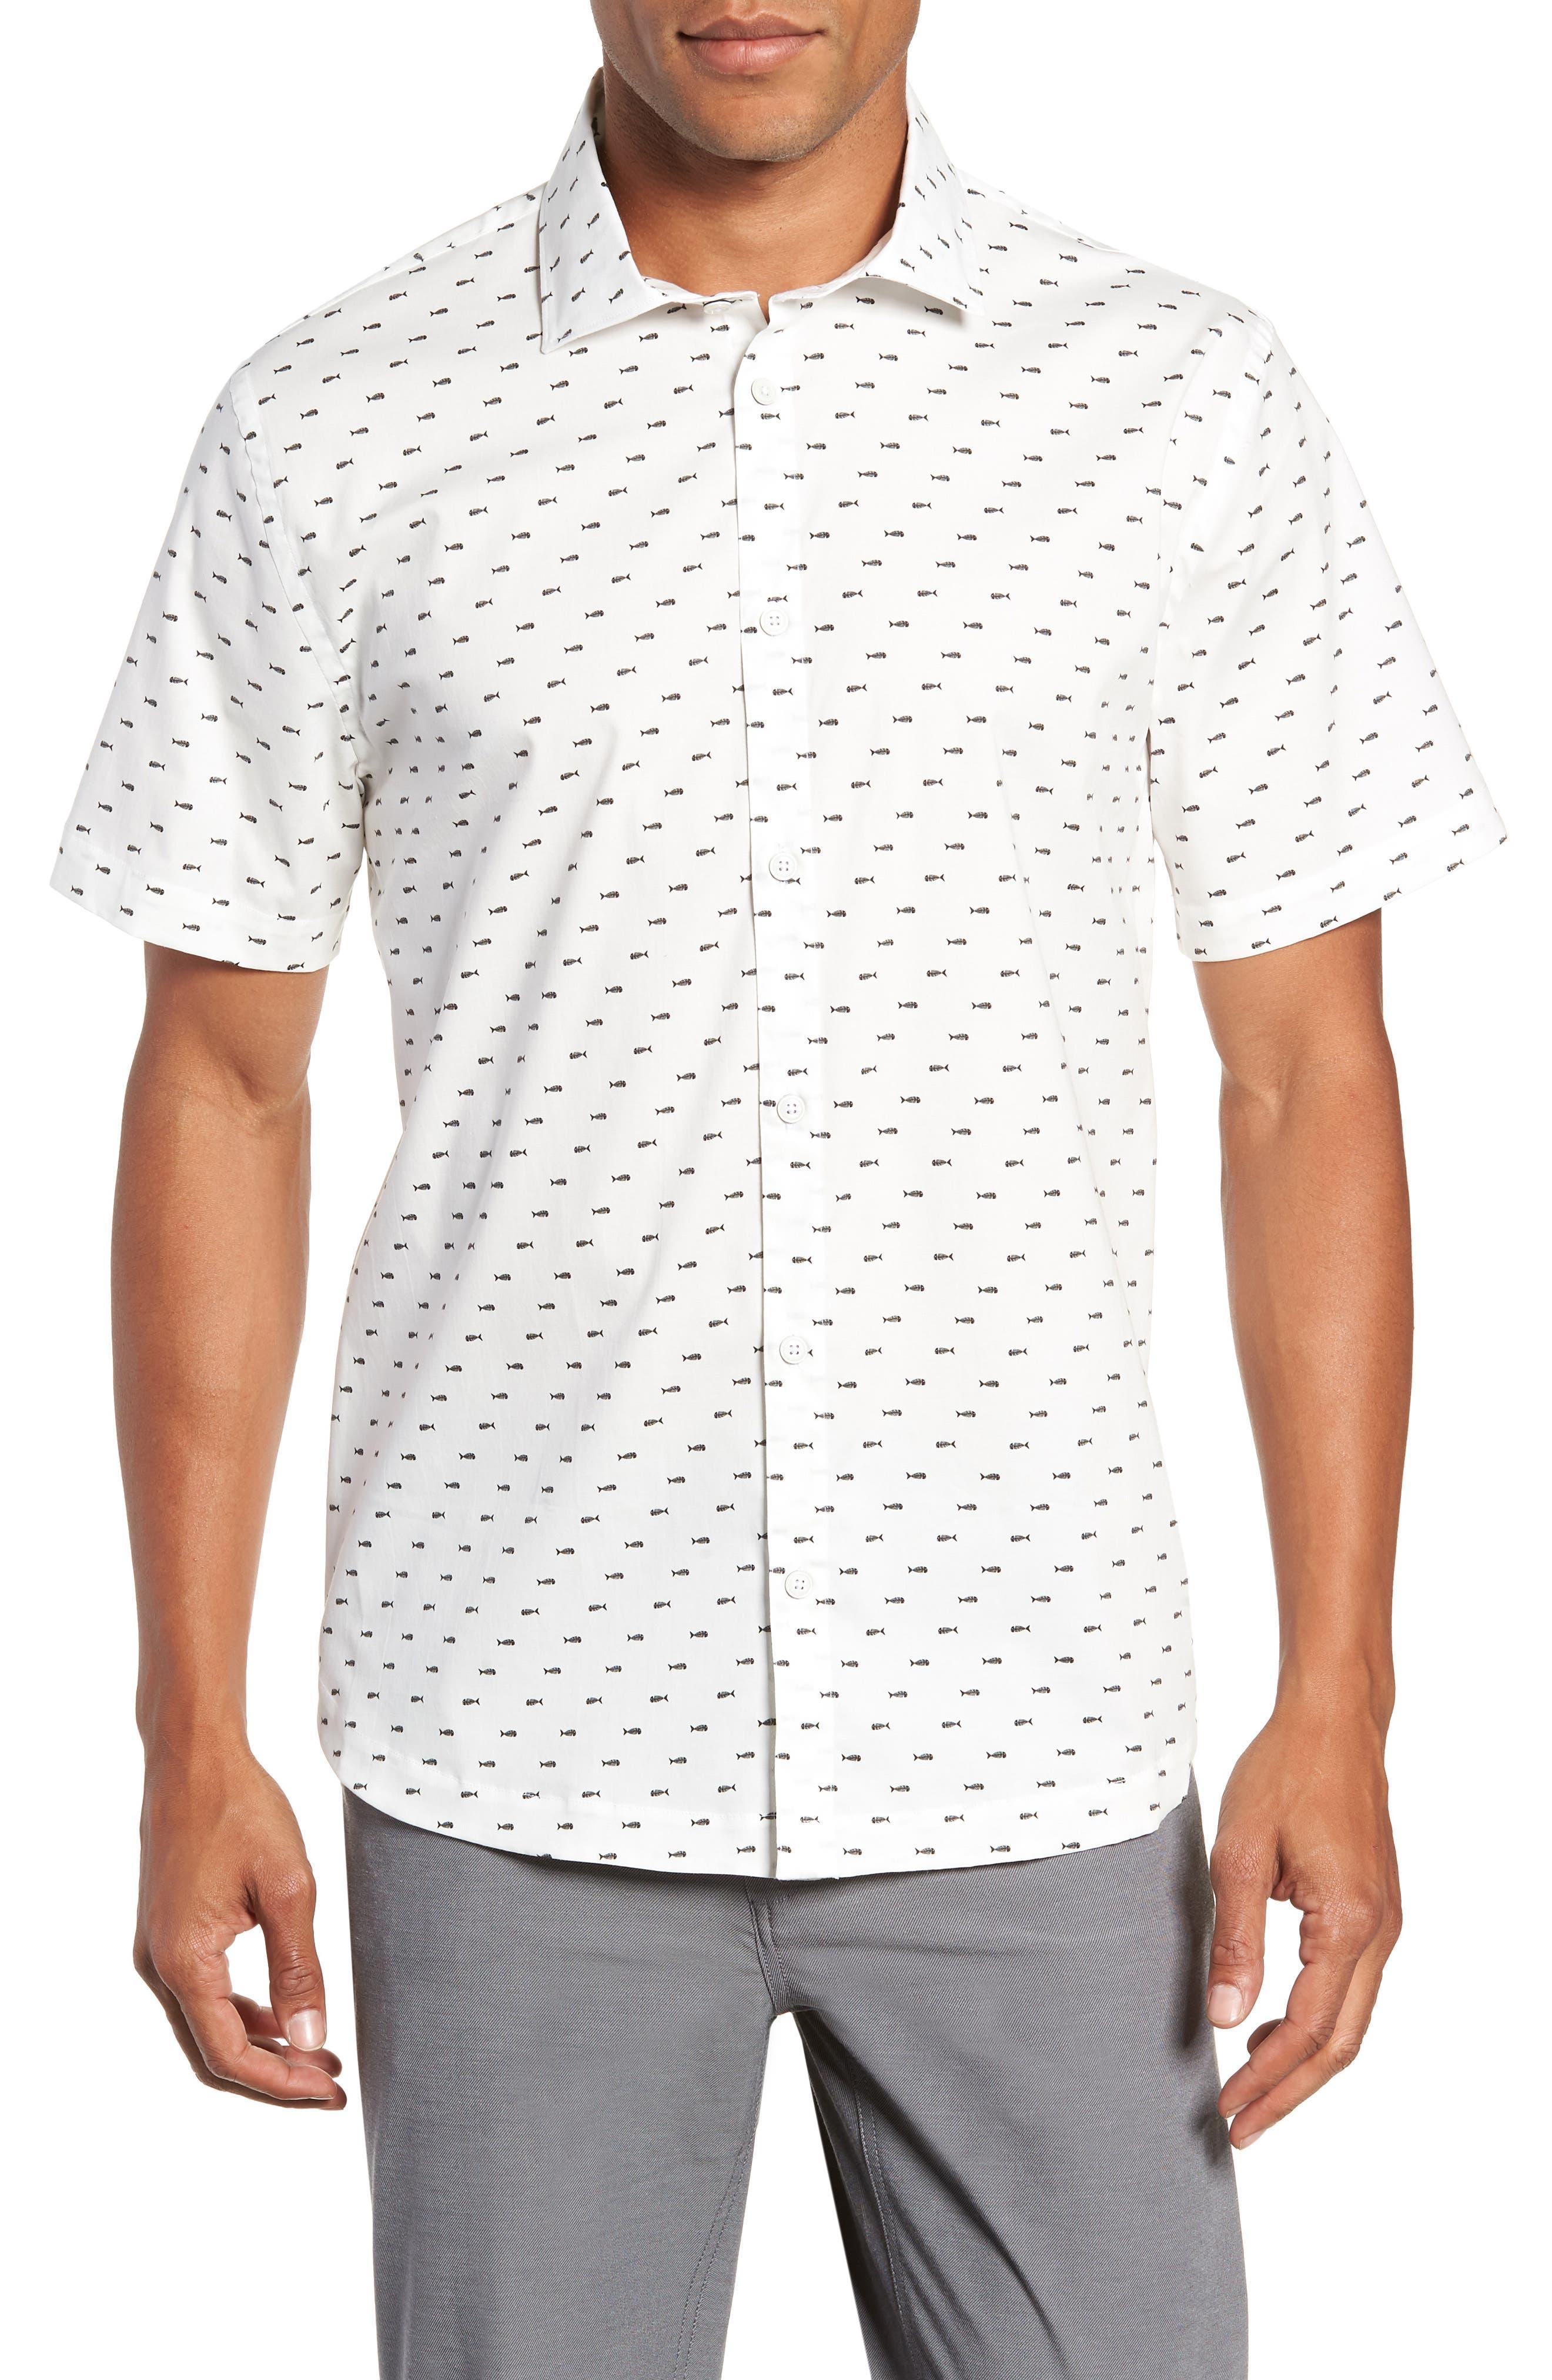 Cabana Regular Fit Sport Shirt,                             Main thumbnail 1, color,                             FISH BONES